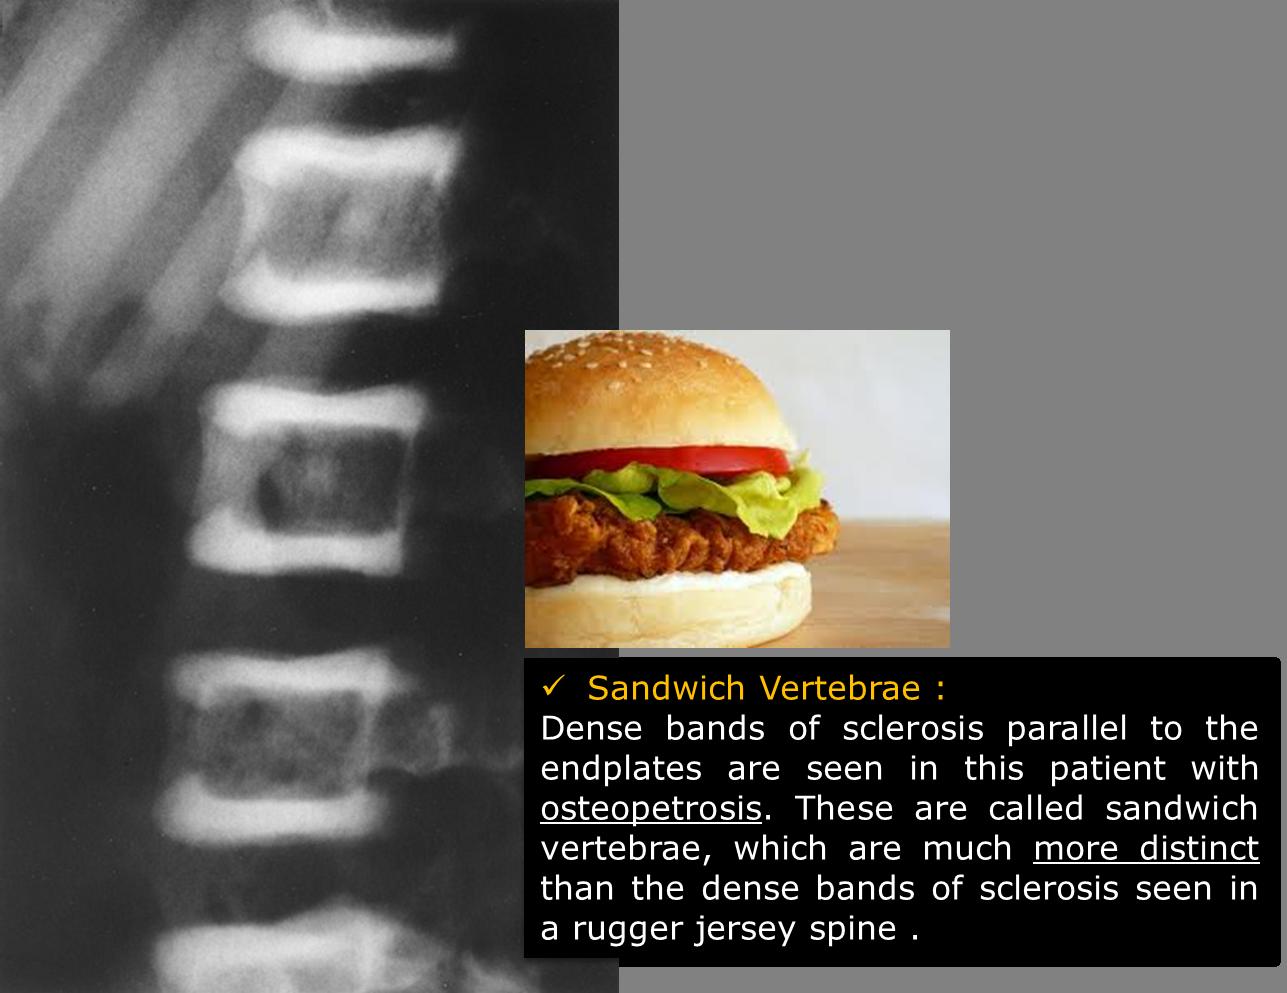 Sandwich Vertebrae - Osteopetrosis